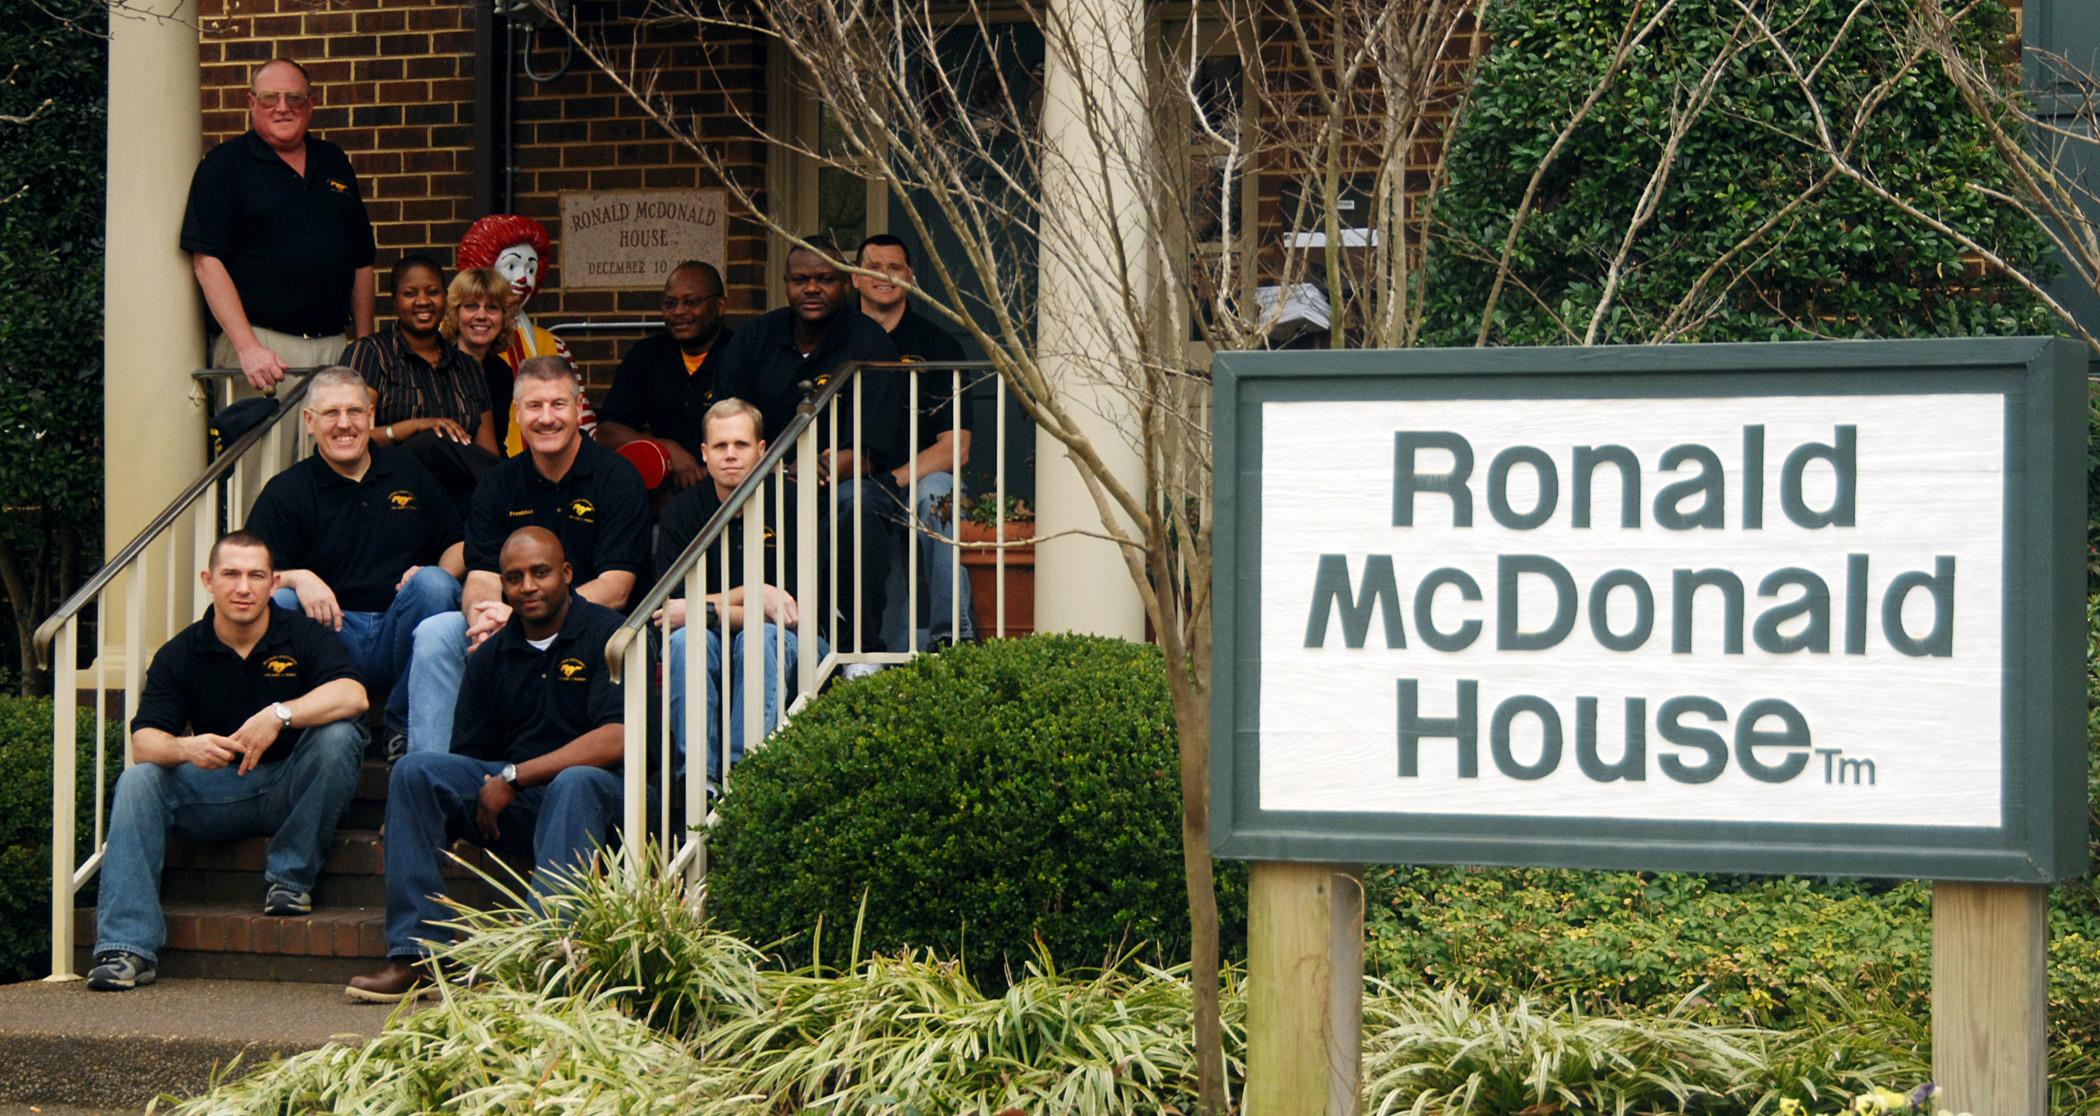 Ronald Mcdonald Family Room Primary Children S